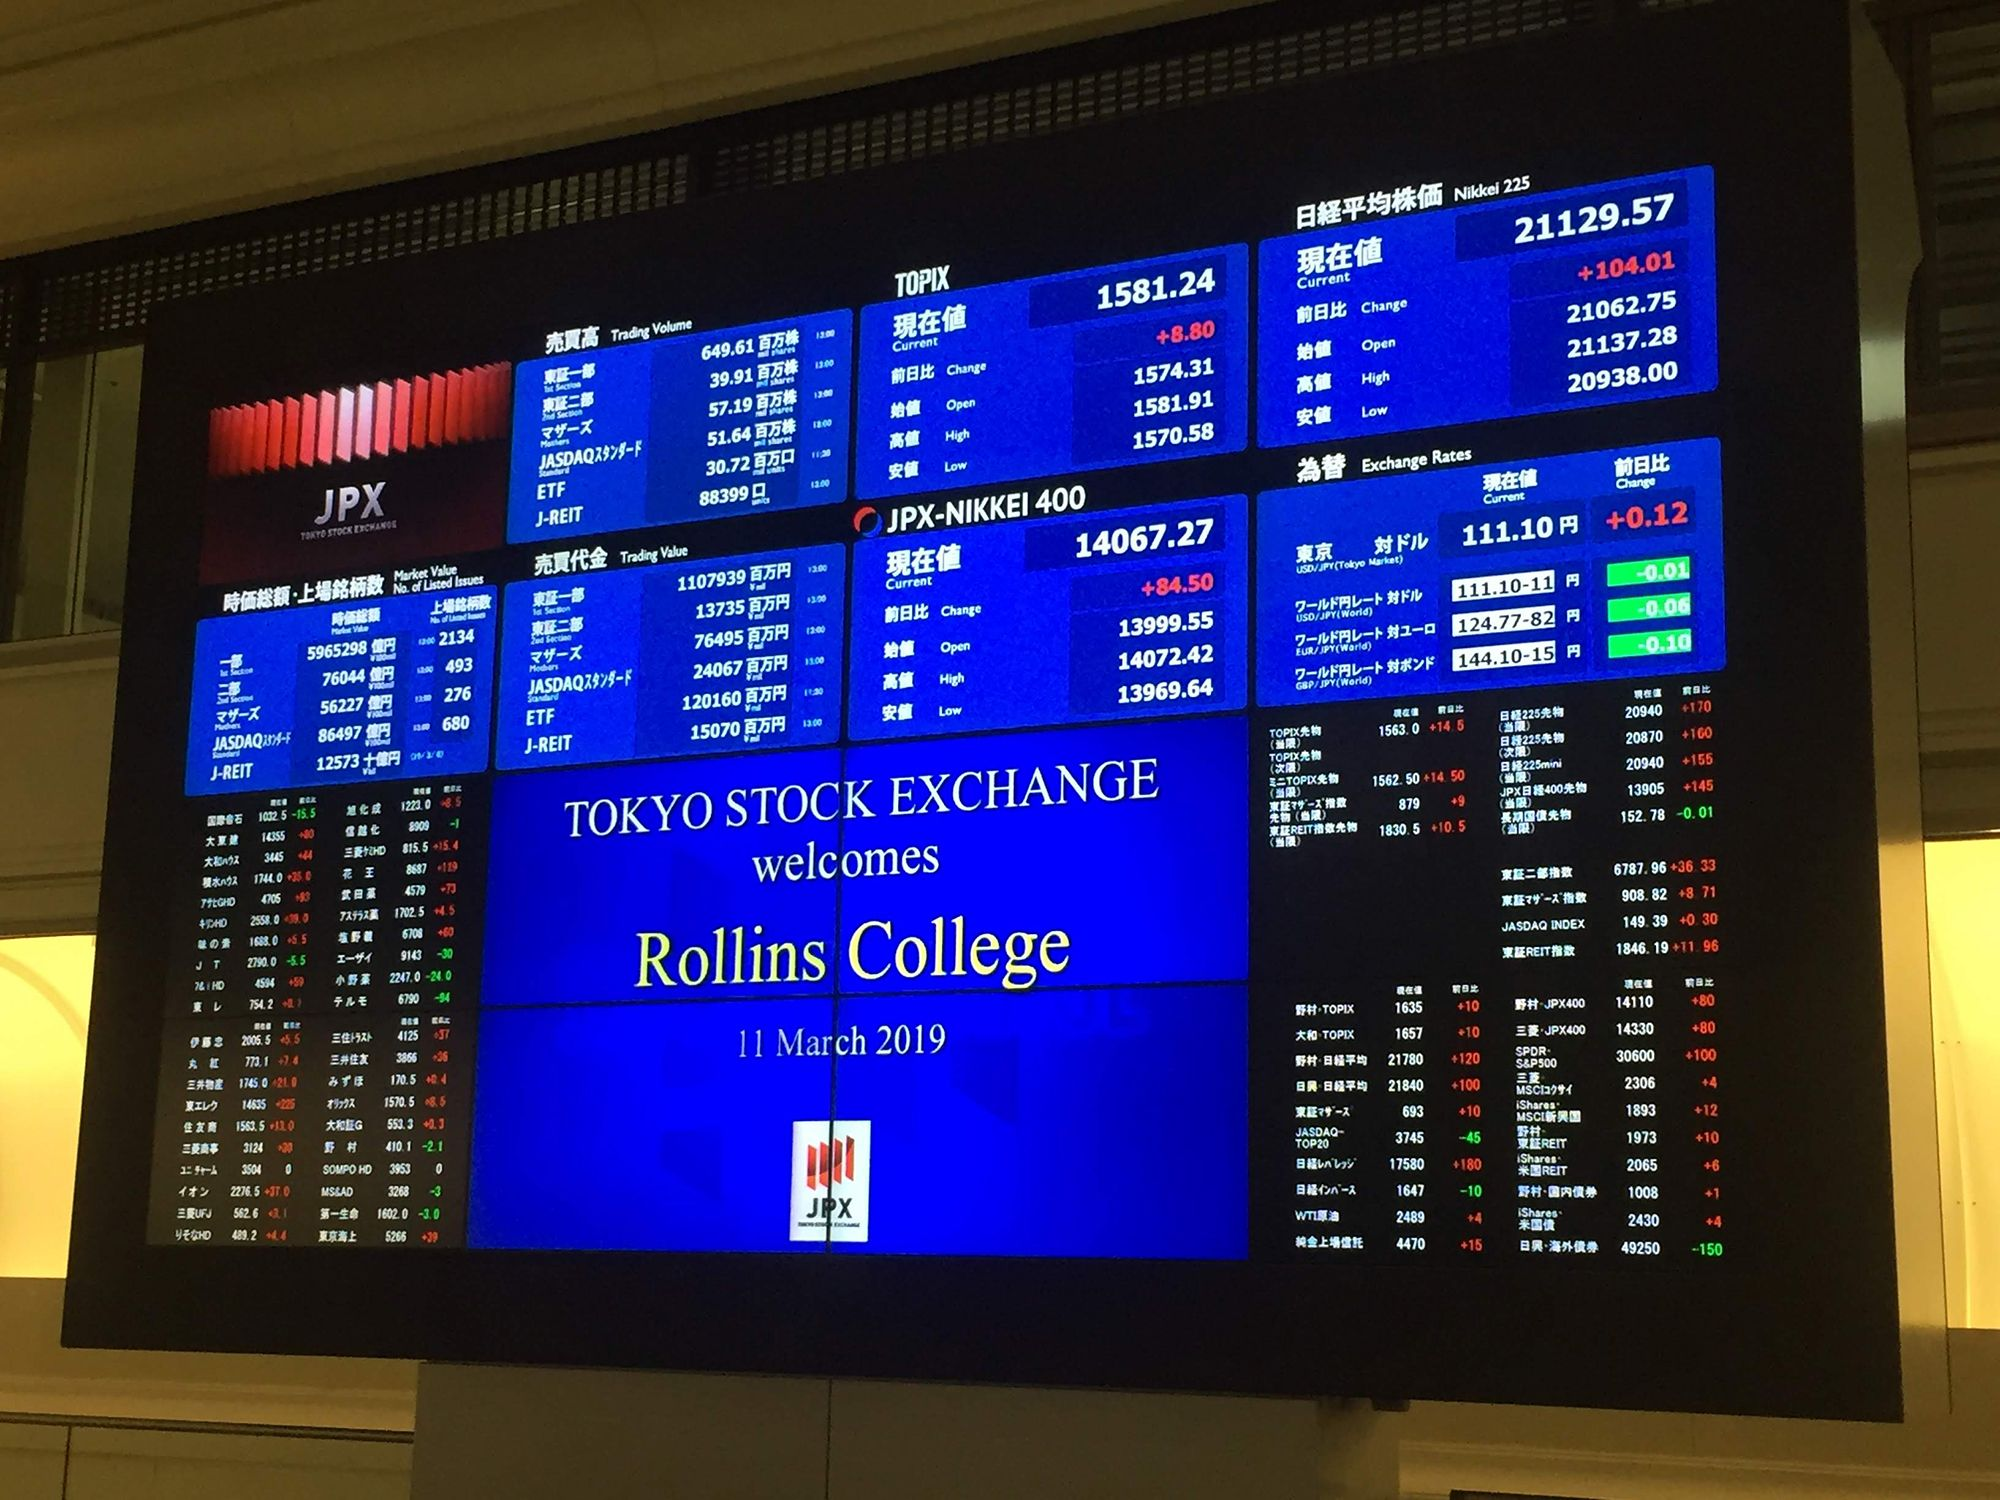 Stock ticker at the Tokyo Stock Exchange